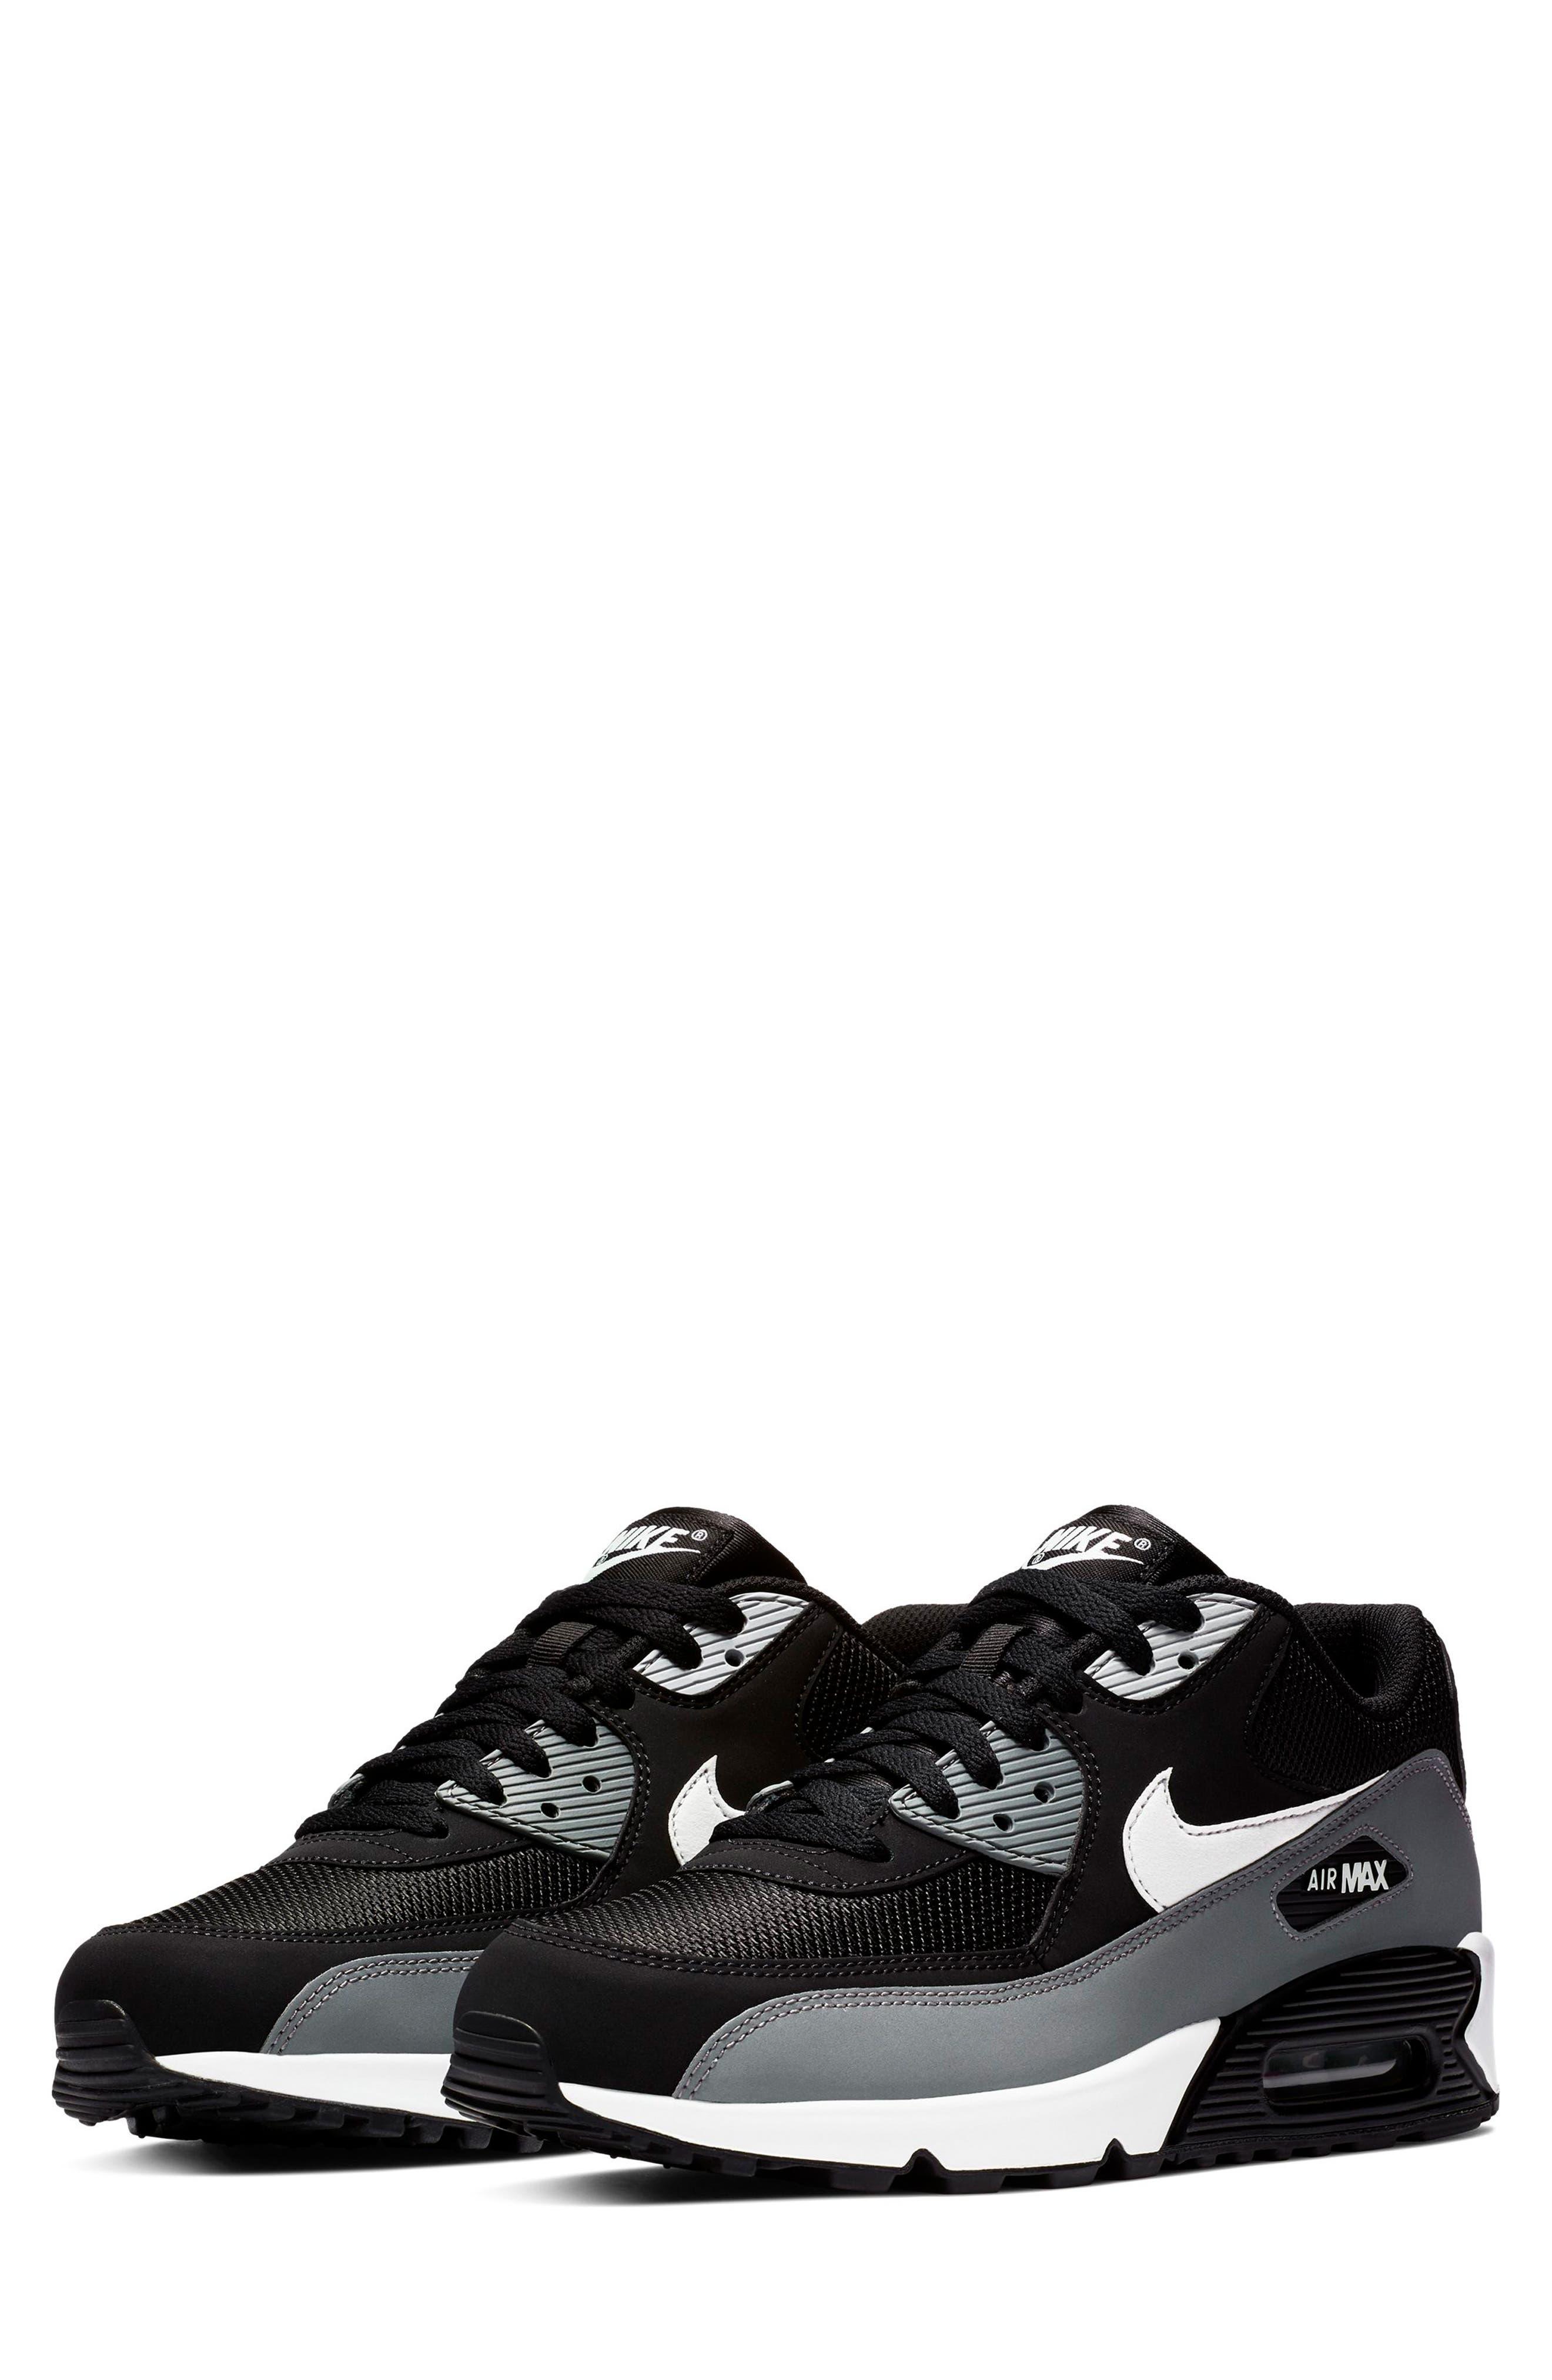 Air Max 90 Essential Sneaker,                             Main thumbnail 1, color,                             BLACK/ WHITE/ COOL GREY